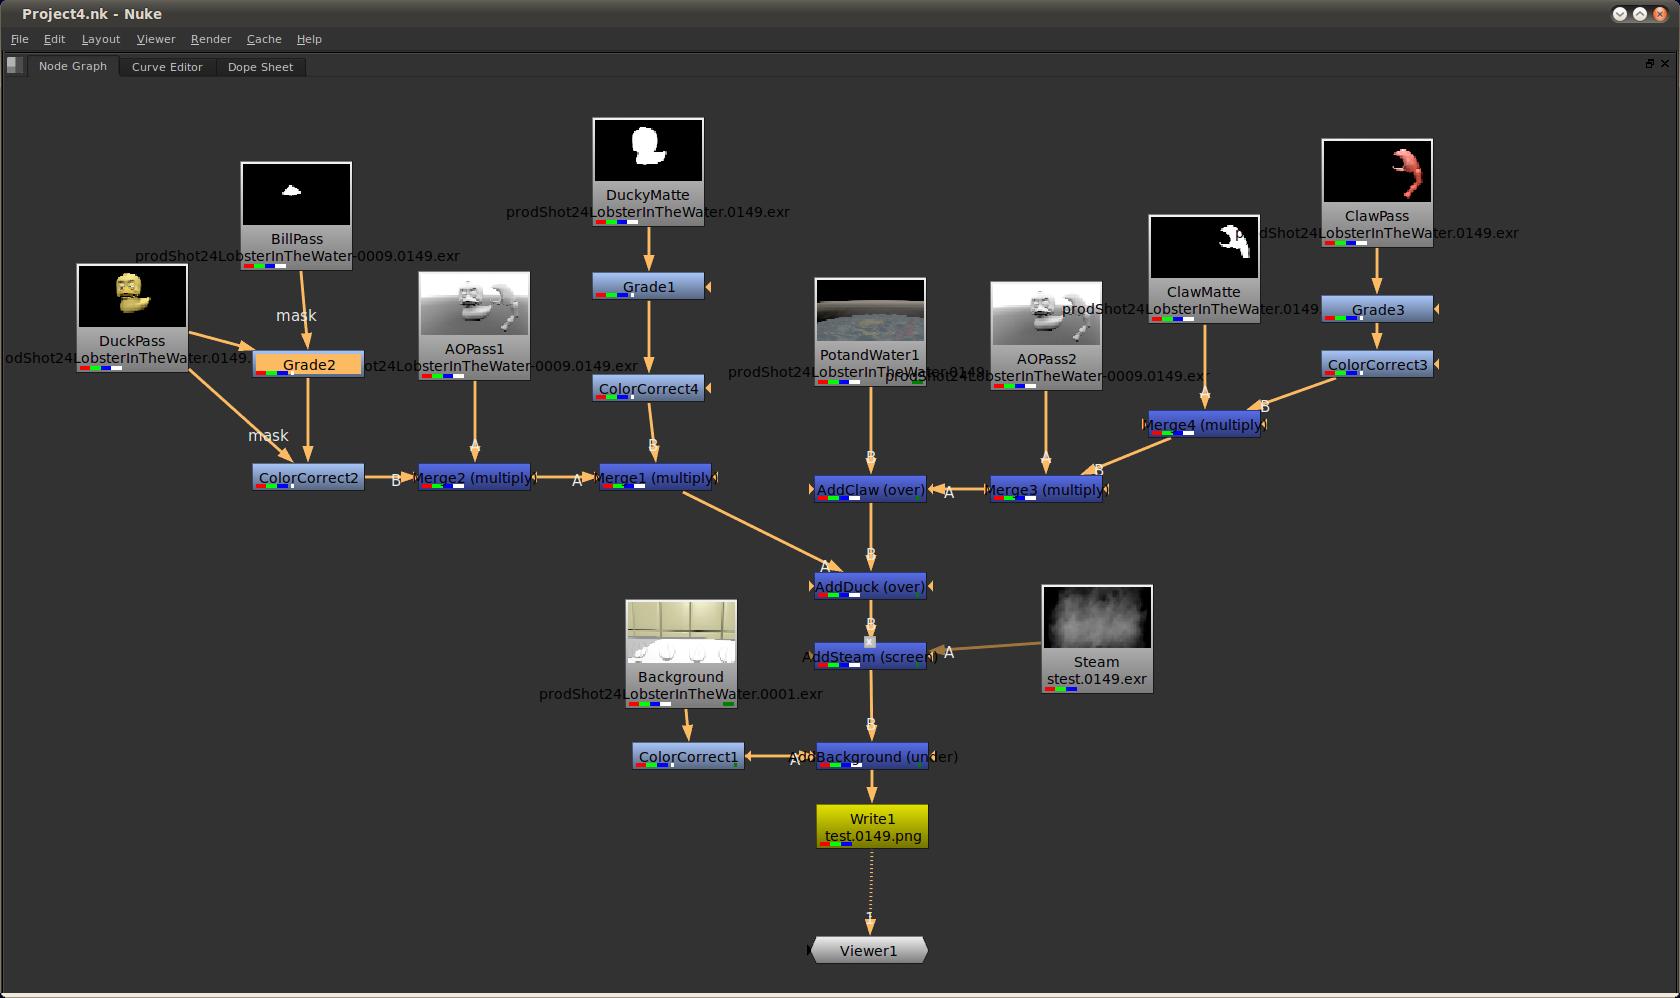 Screenshot Project4 Nk Nuke Png 1680 998 Modeling Tips Pixel Keep It Simple